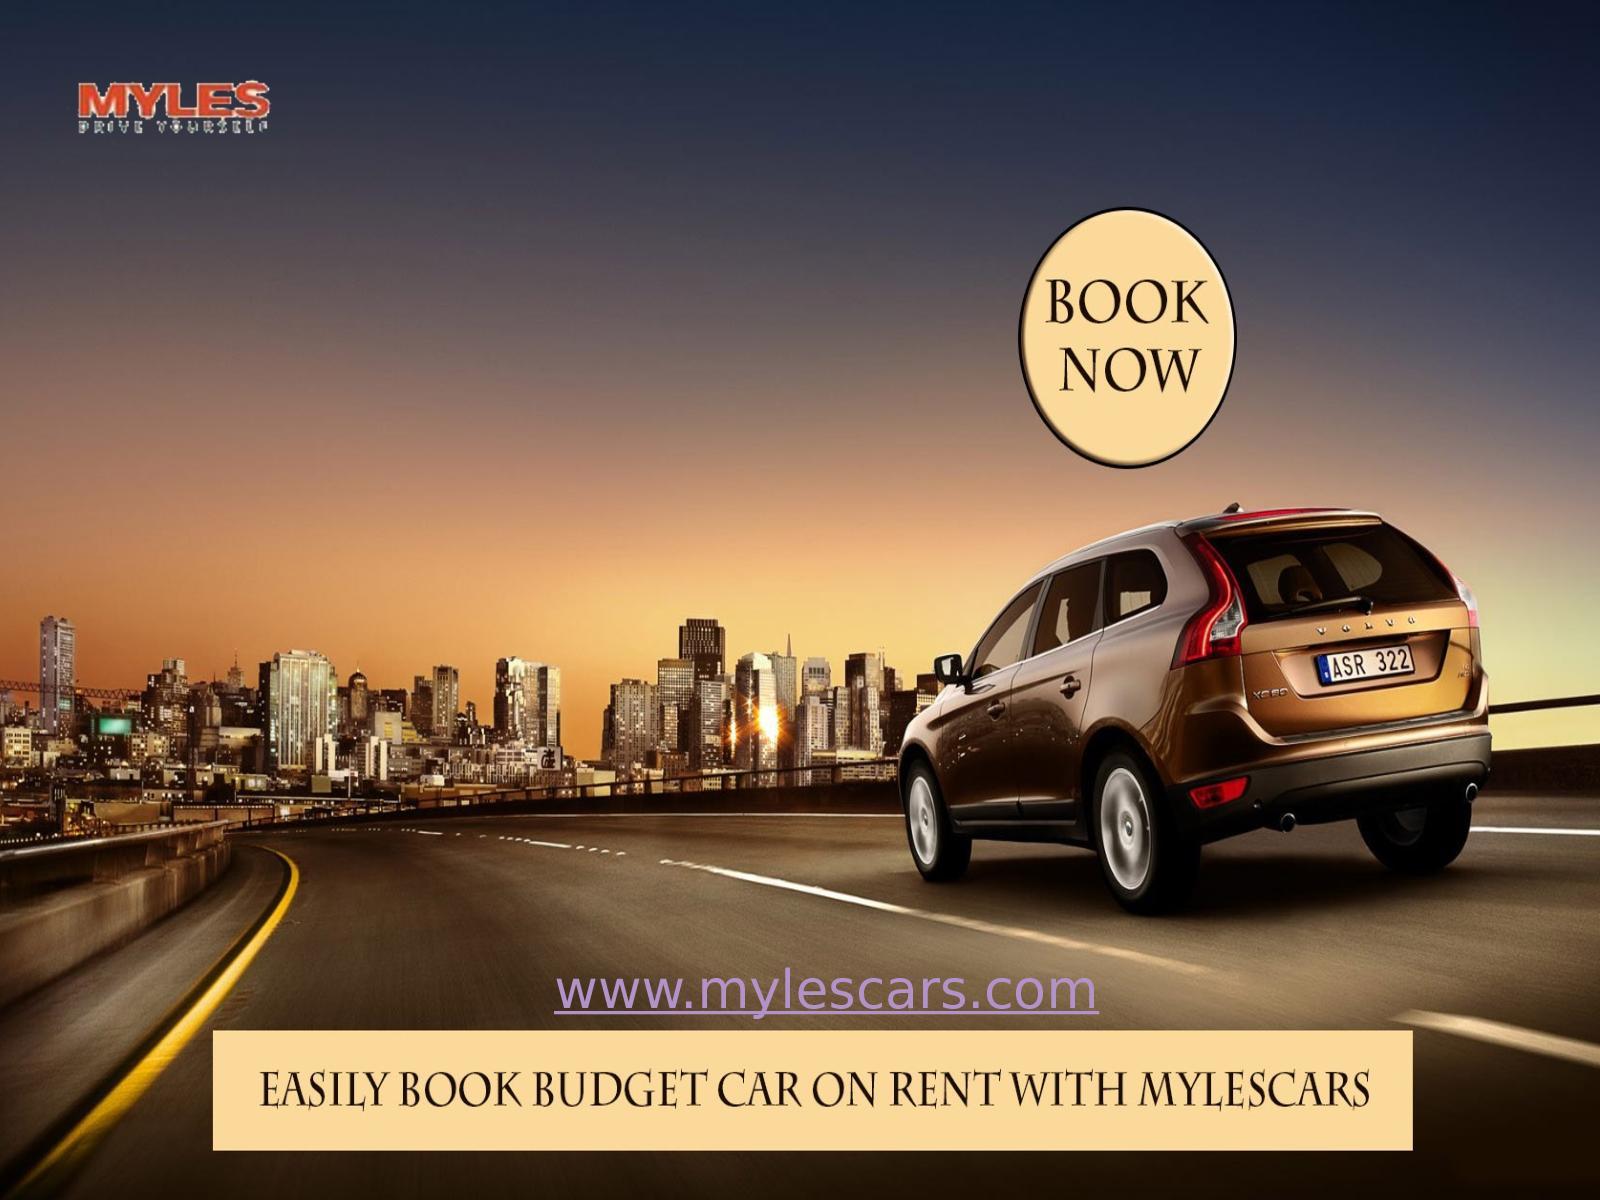 Calameo Budget Friendly Car Rental Service In India